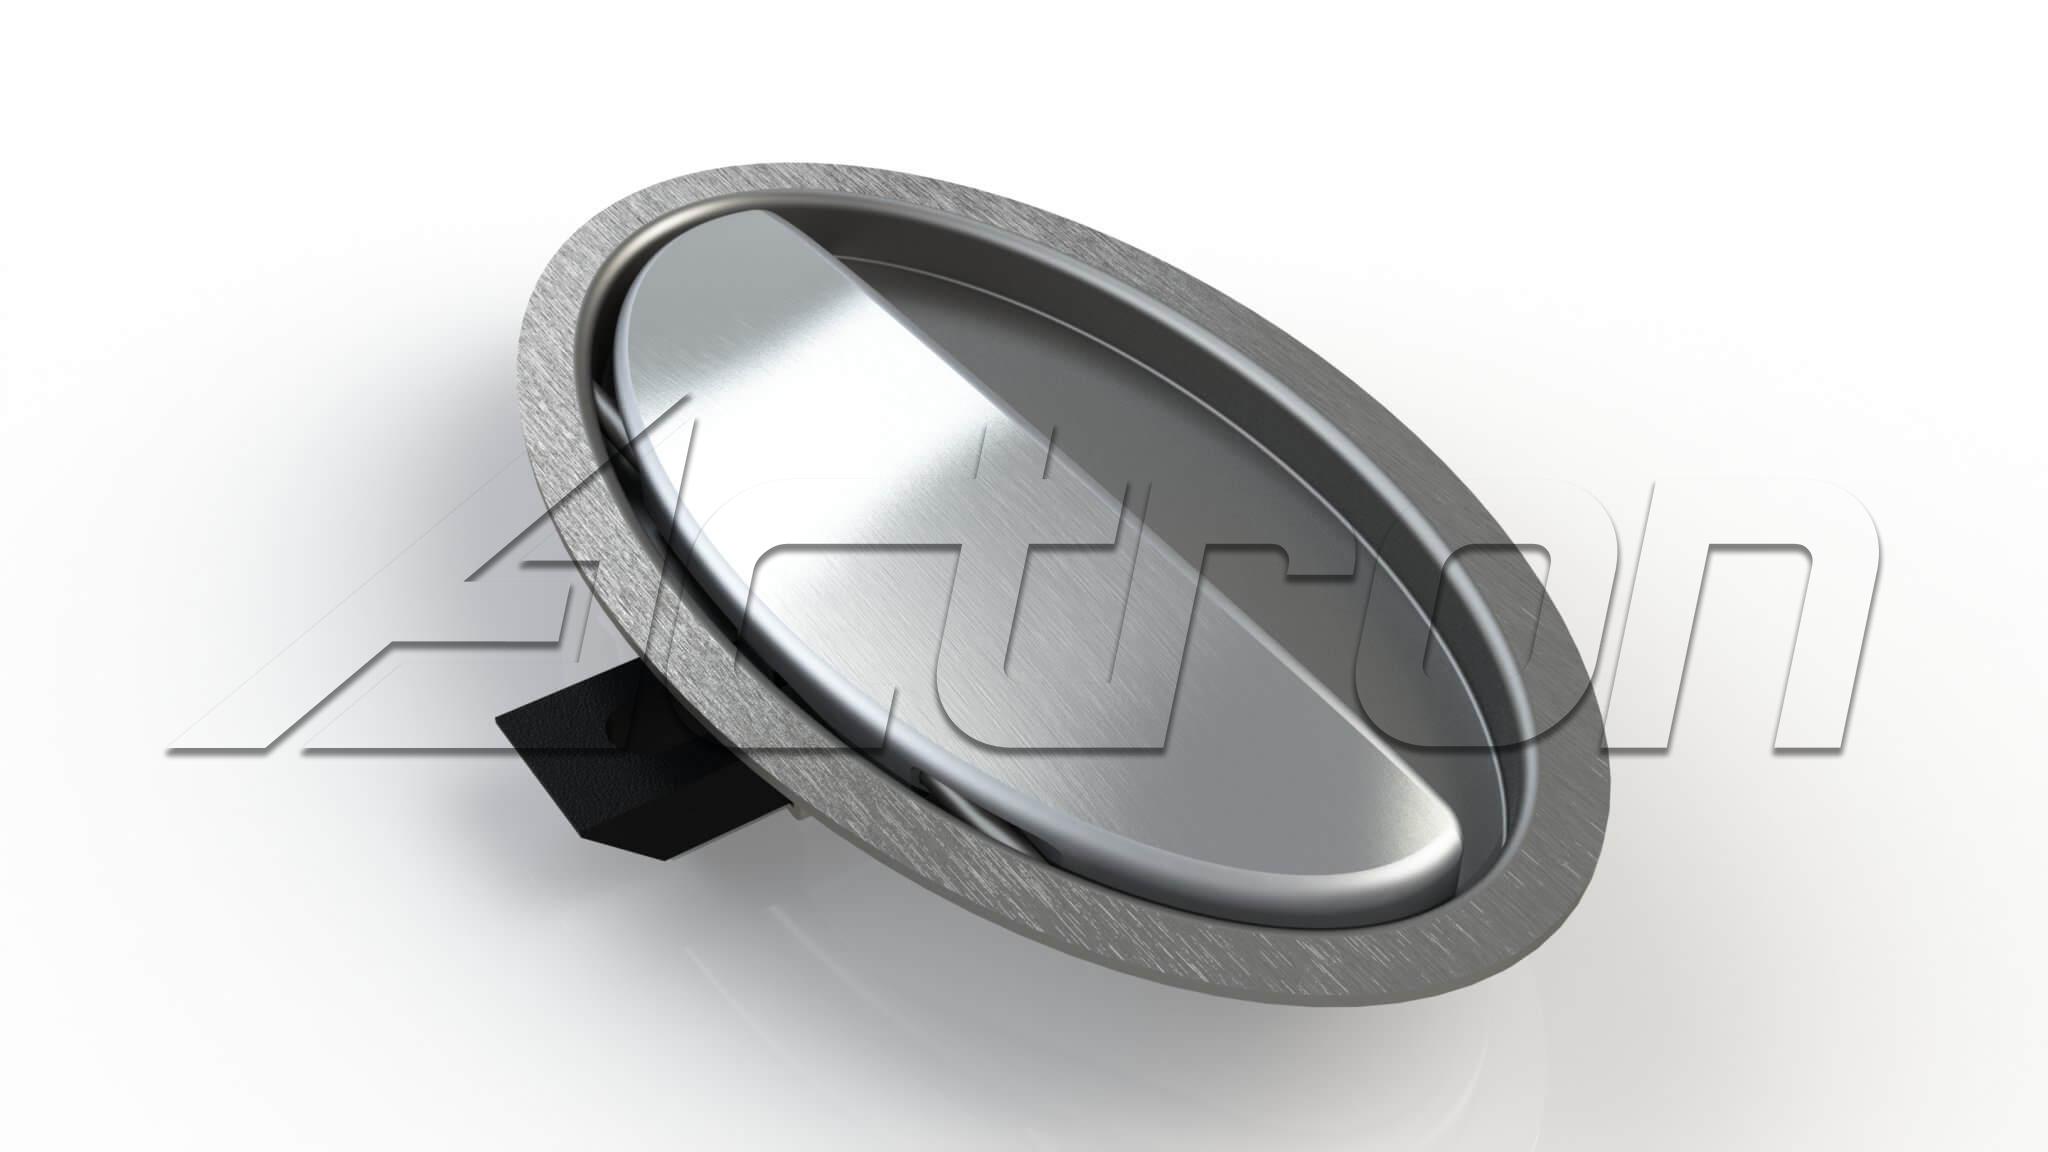 latch-assy-8211-paddle-3924-a23390.jpg